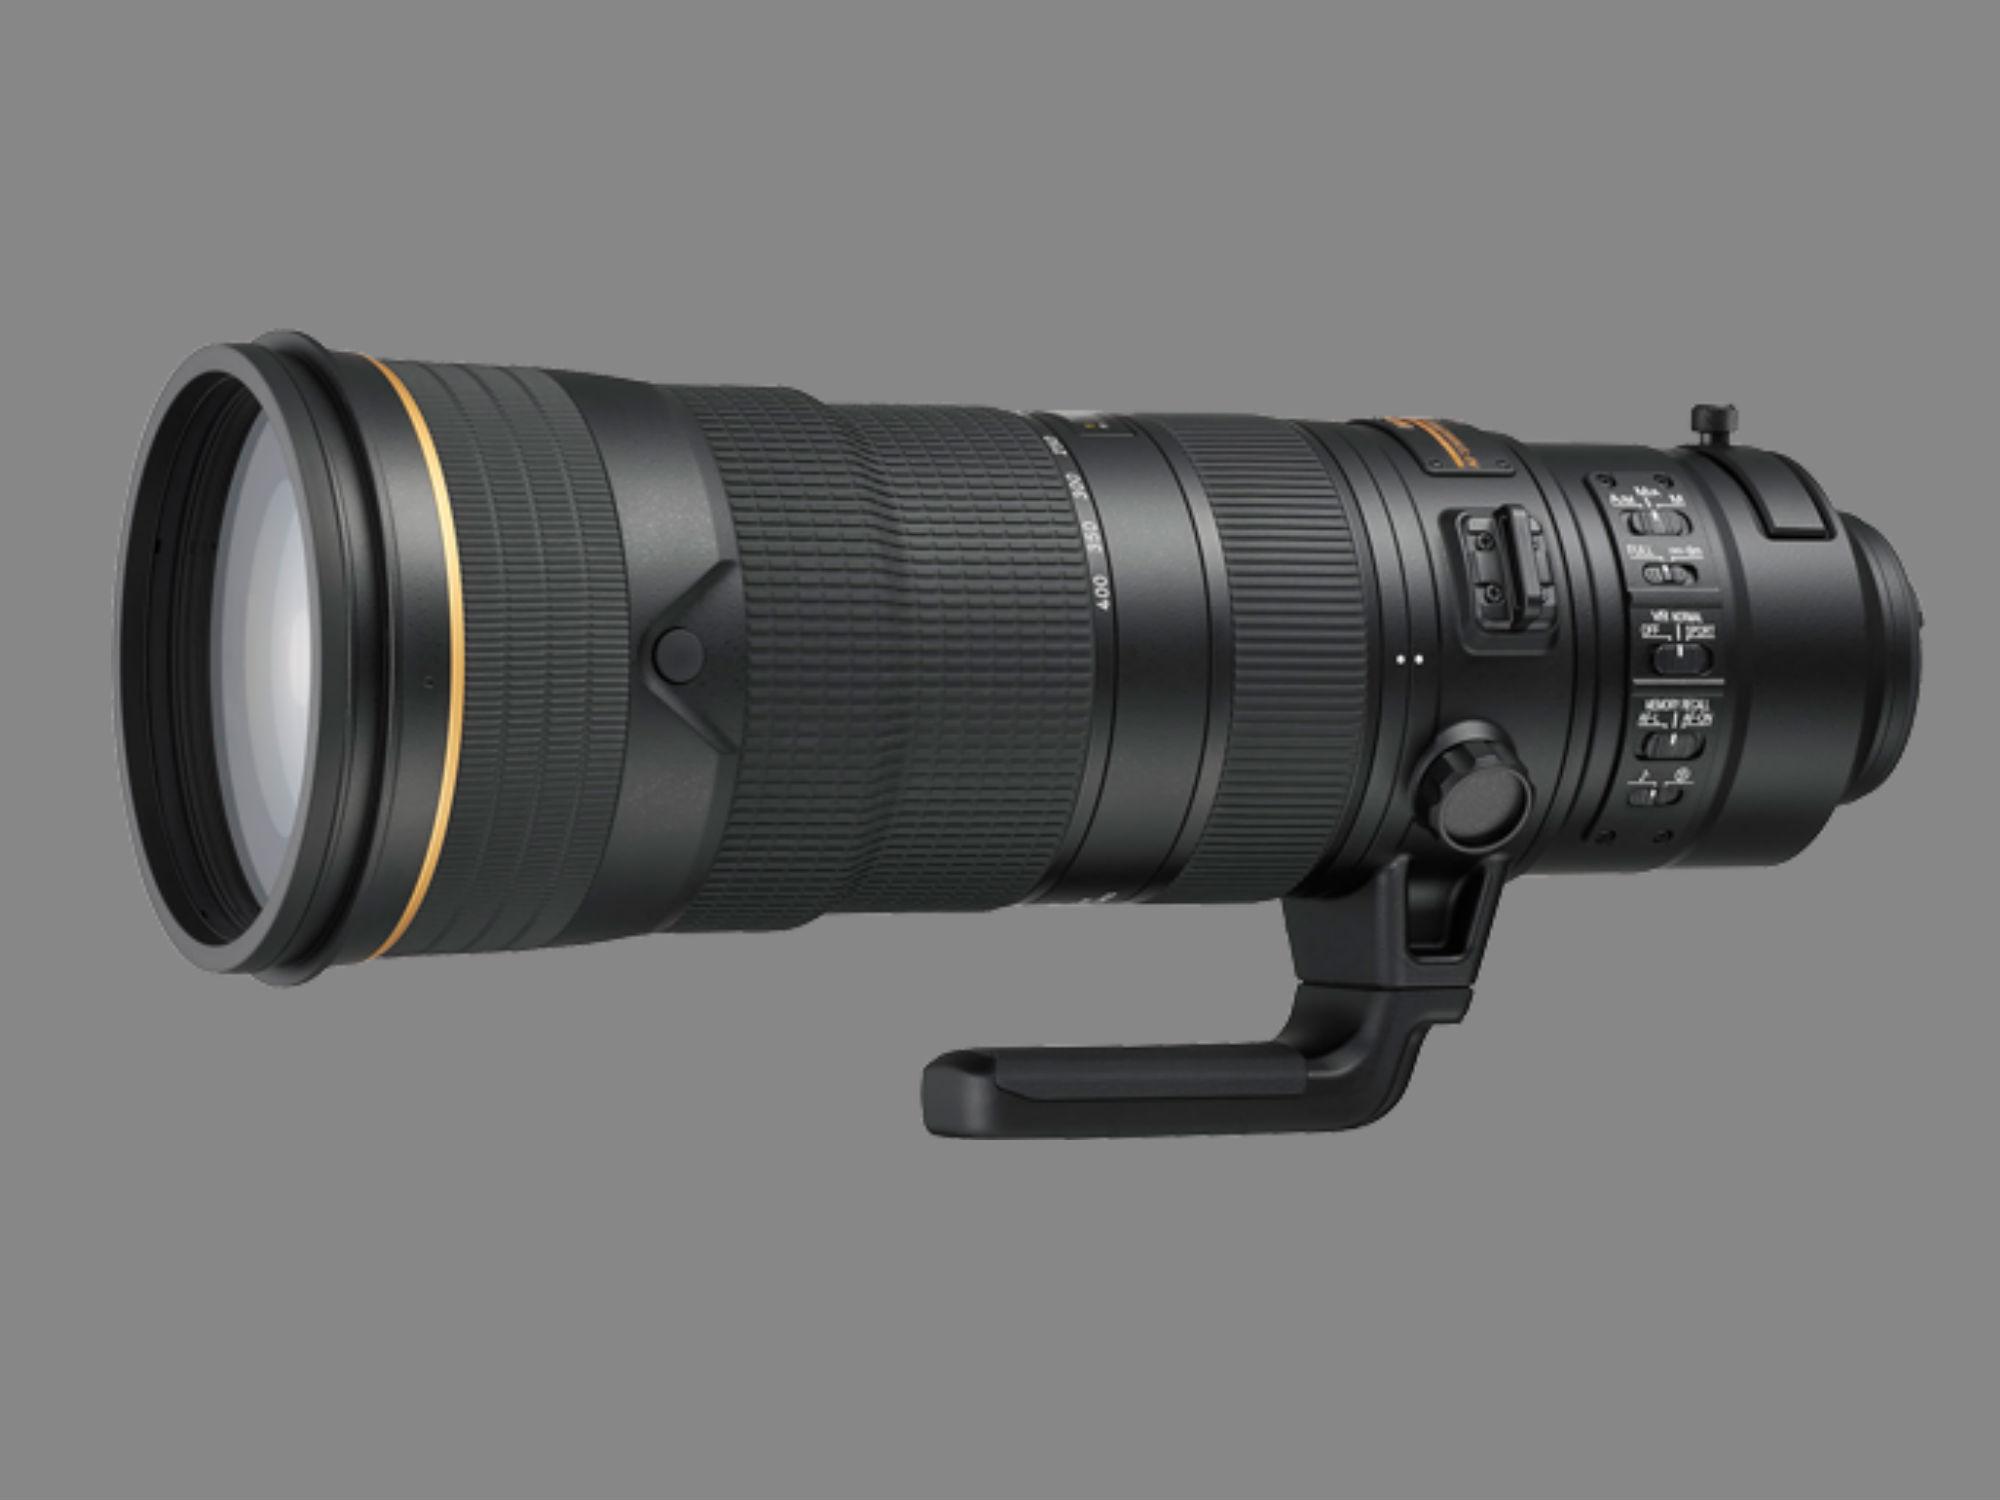 nikon180 400mm image